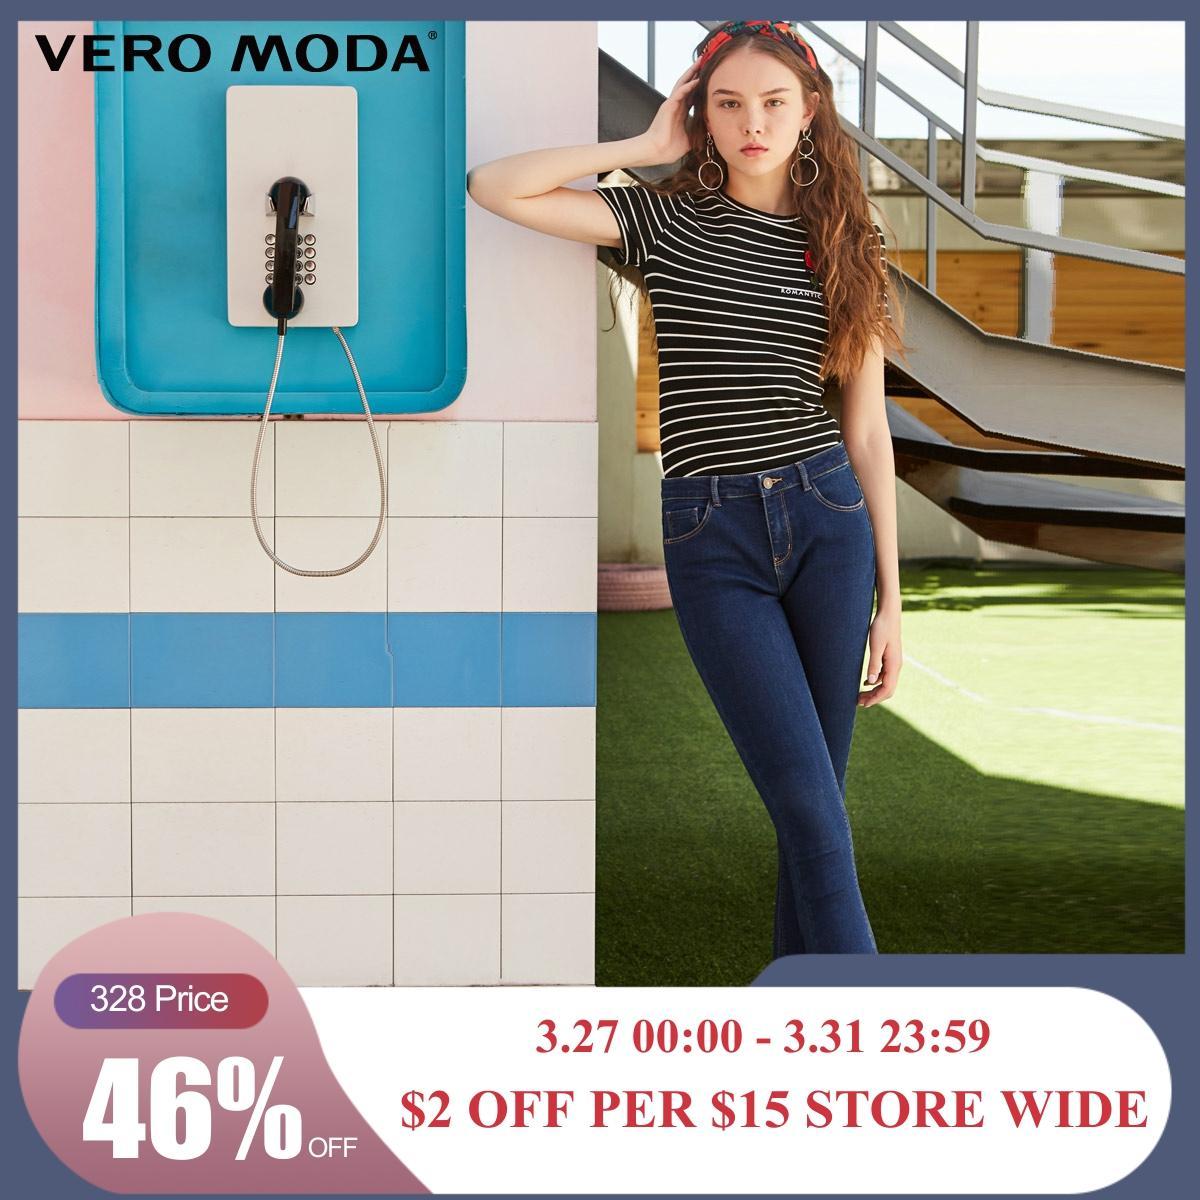 Vero Moda New Arrivals Women's Slim Fit Brushed Villus Lining Crop Jeans | 318349555